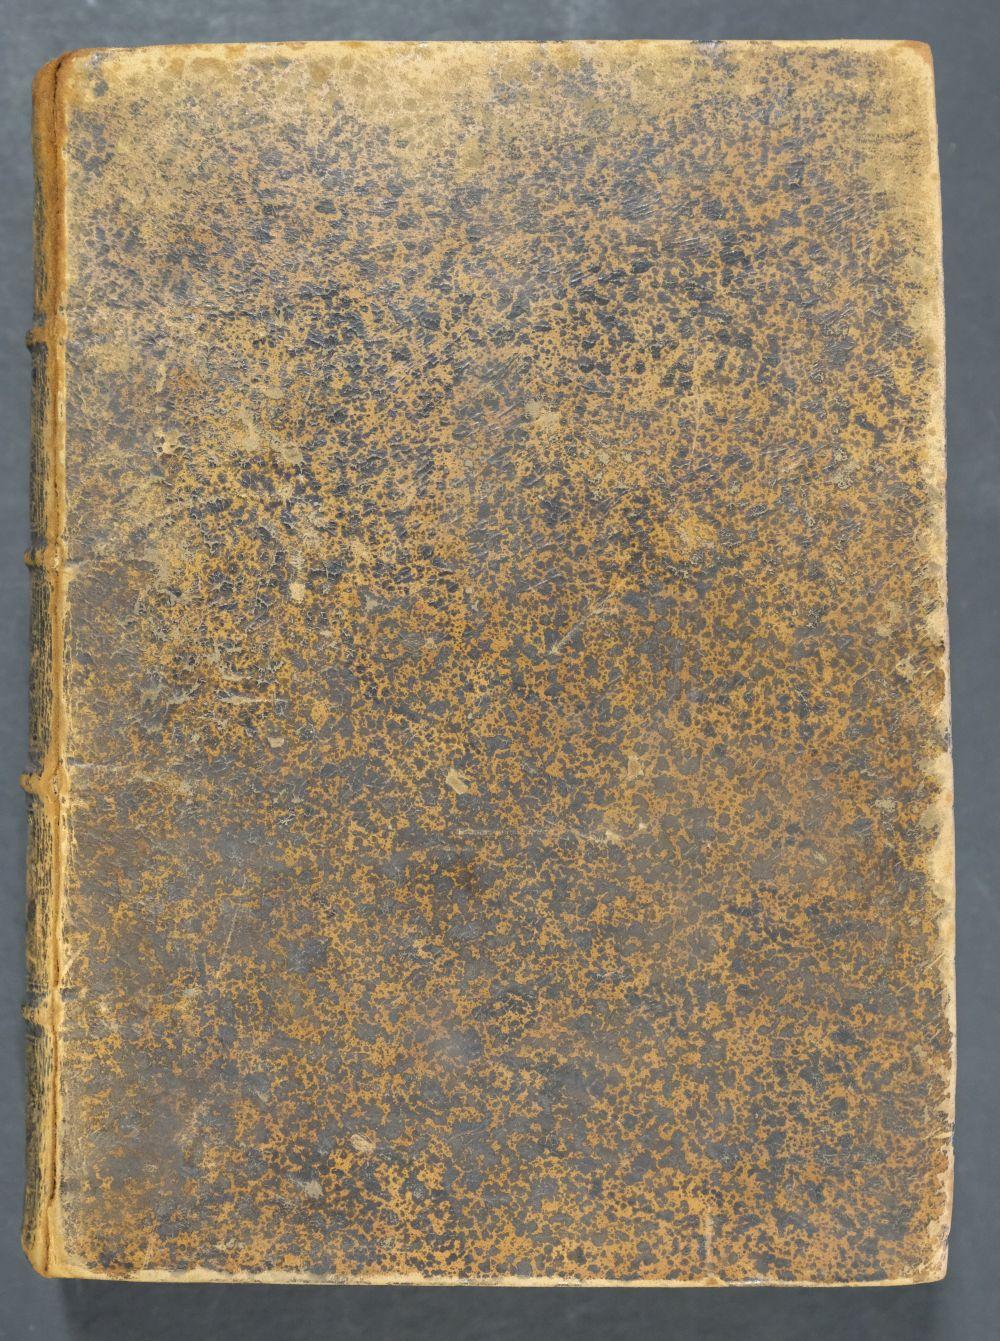 Erizzo (Sebastiano). Discorso sopra le medaglie, 4th edition, 1584, ex libris Fletcher of Saltoun - Image 2 of 11